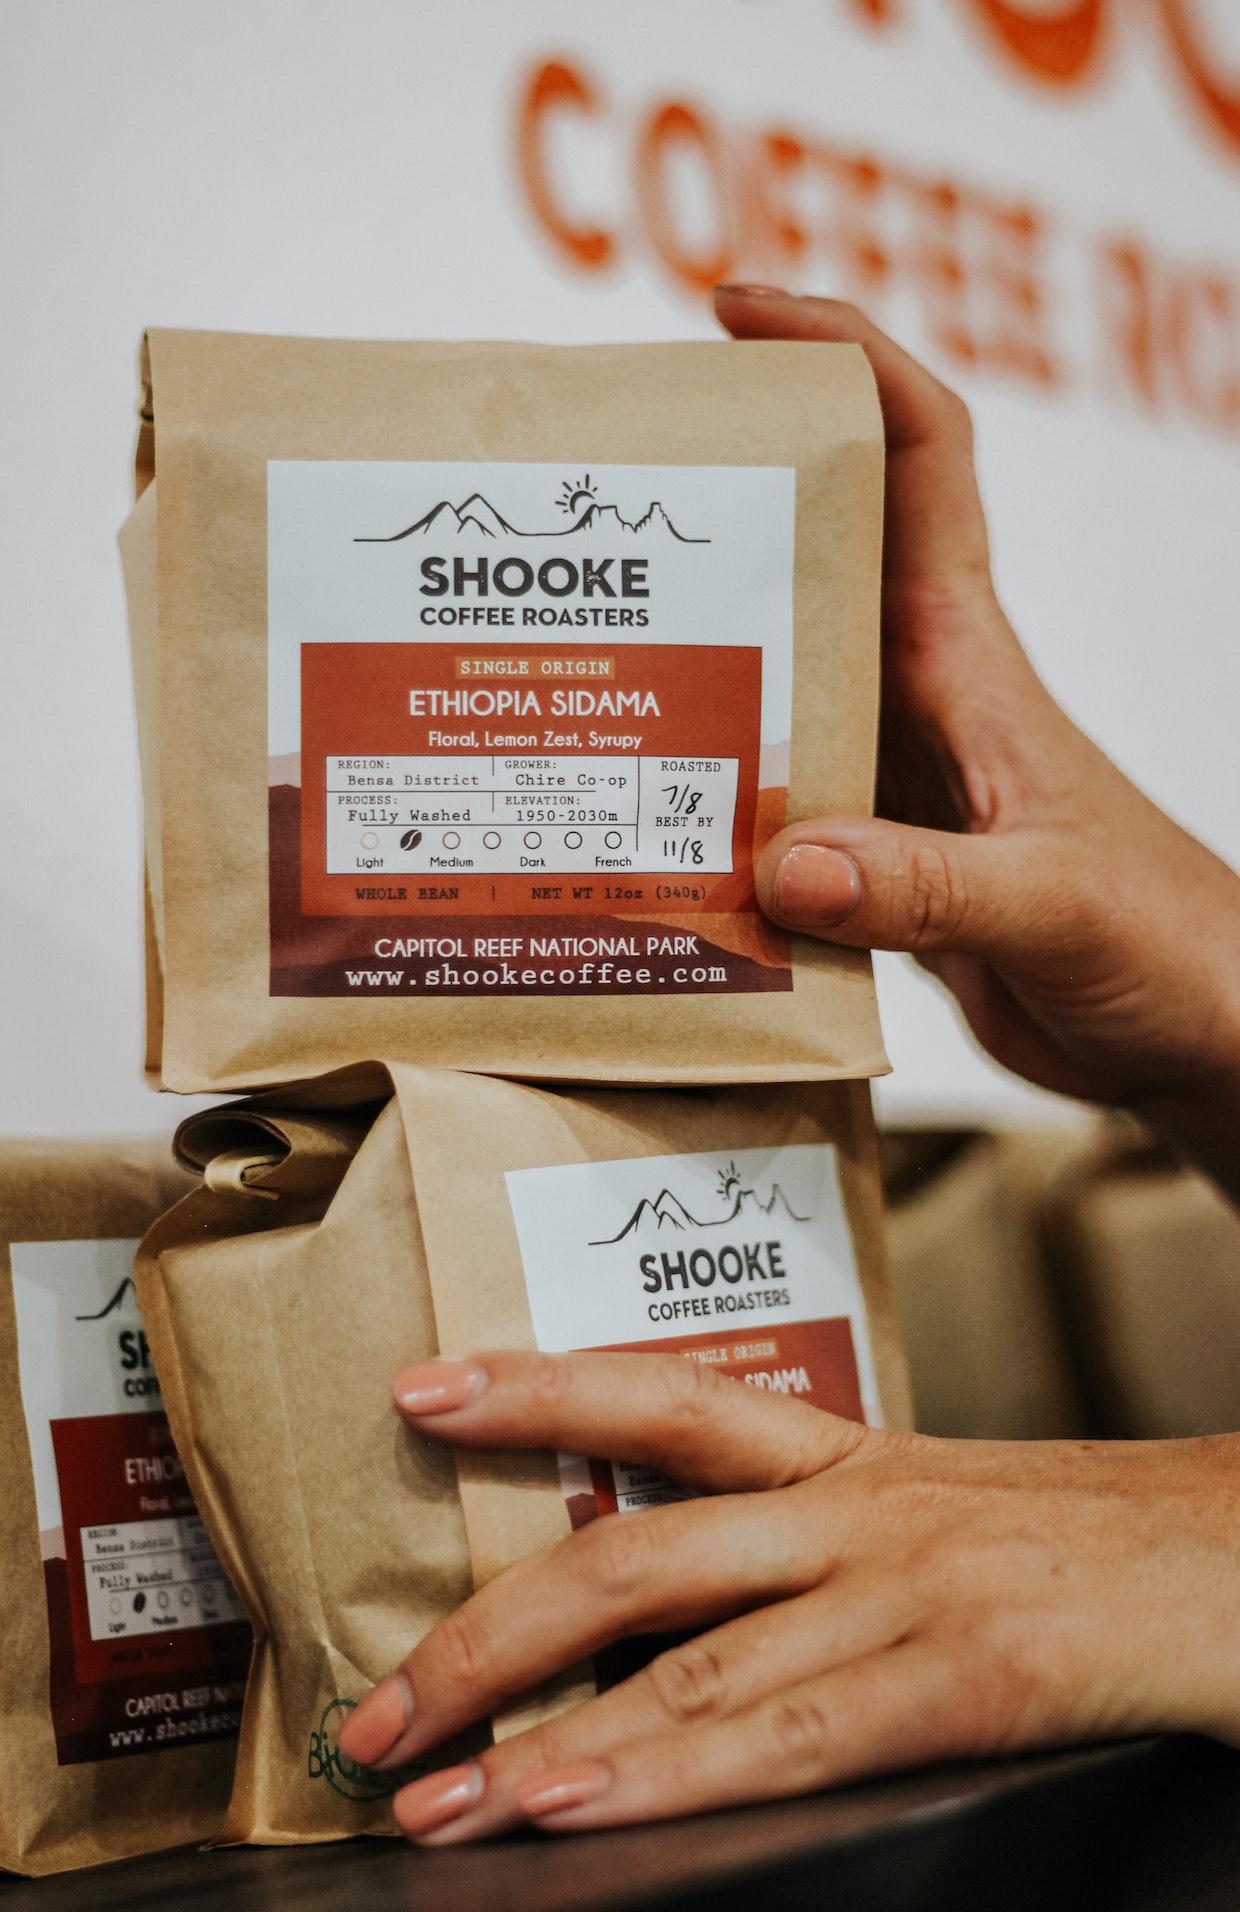 Shooke Coffee bags